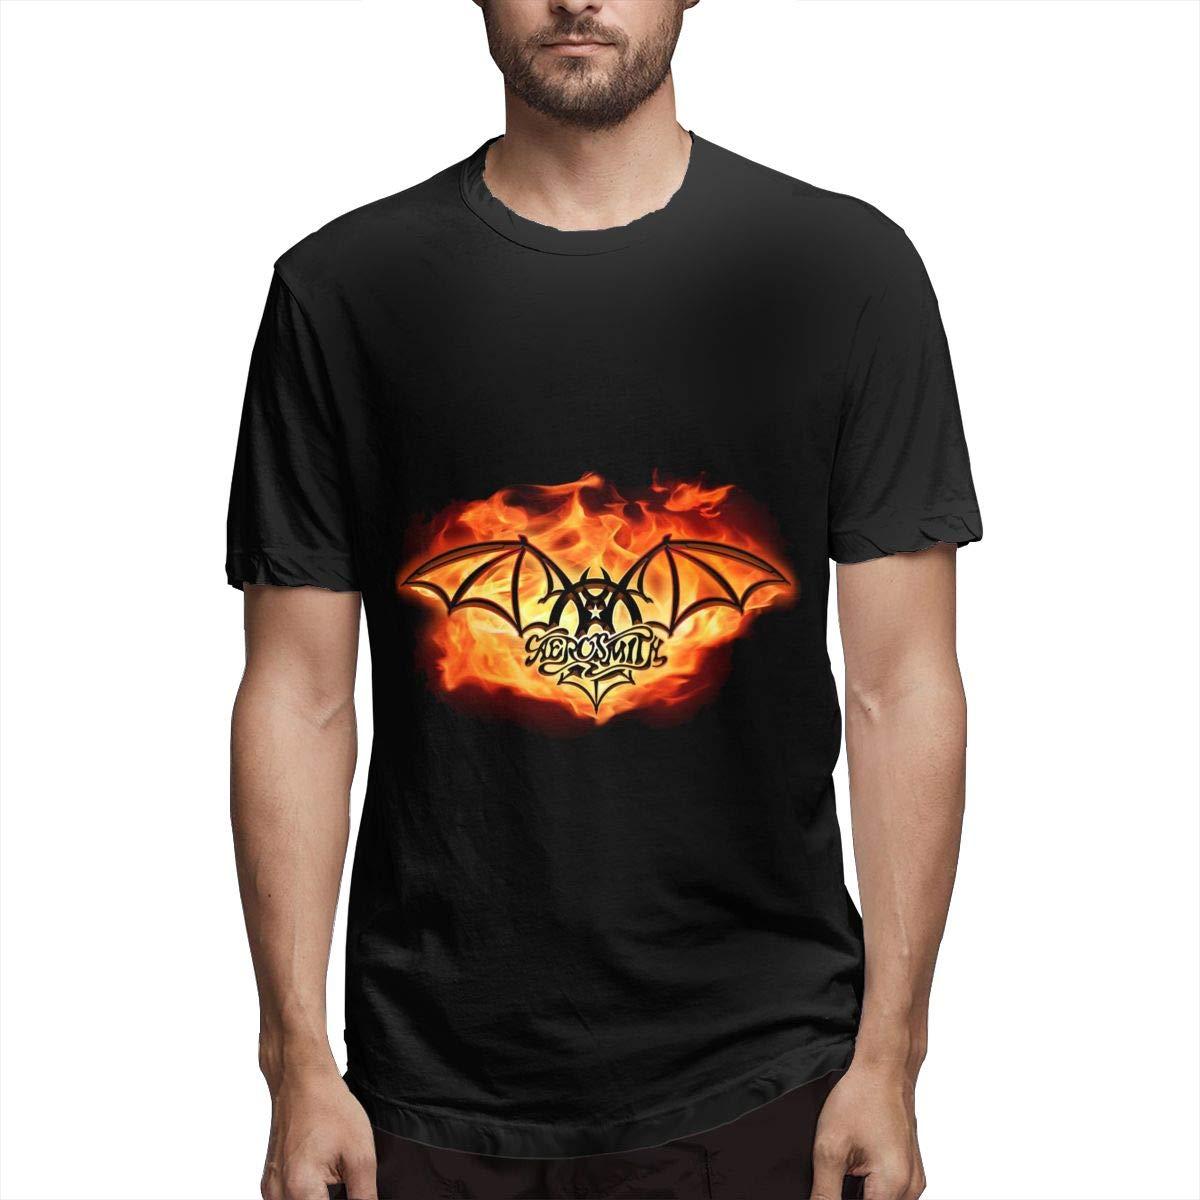 Lihehen S Aerosmith Retro Printing Round Neck Shirt